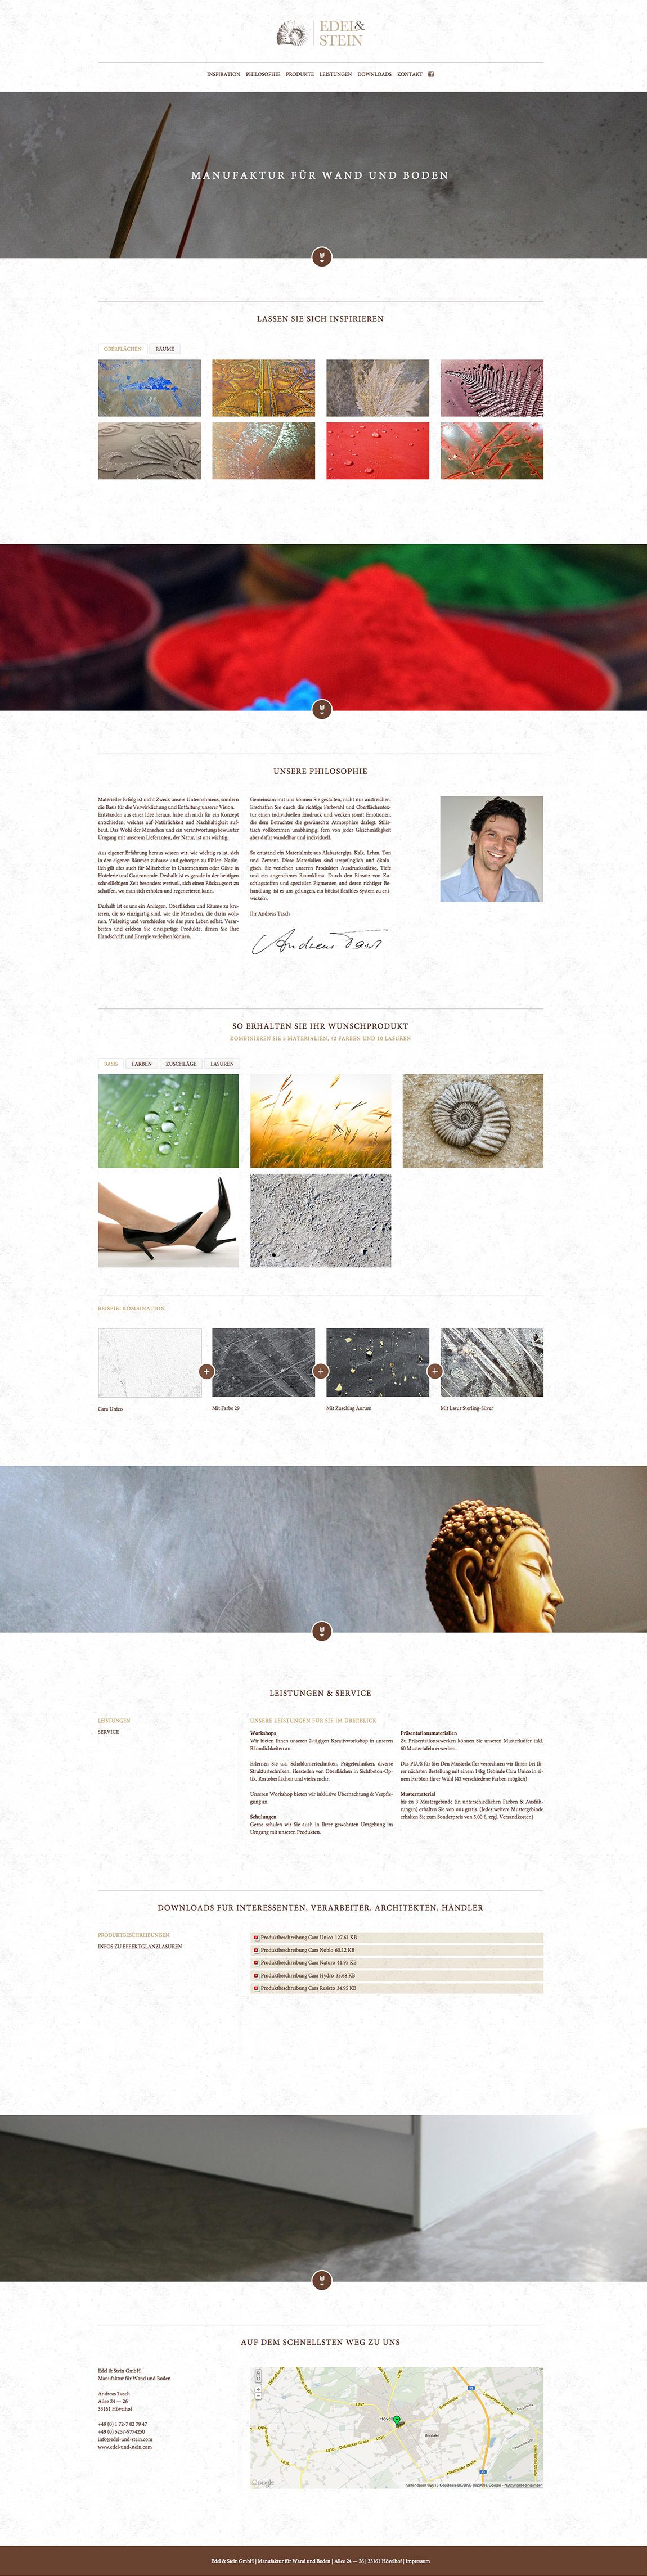 Edel & Stein Website Screenshot